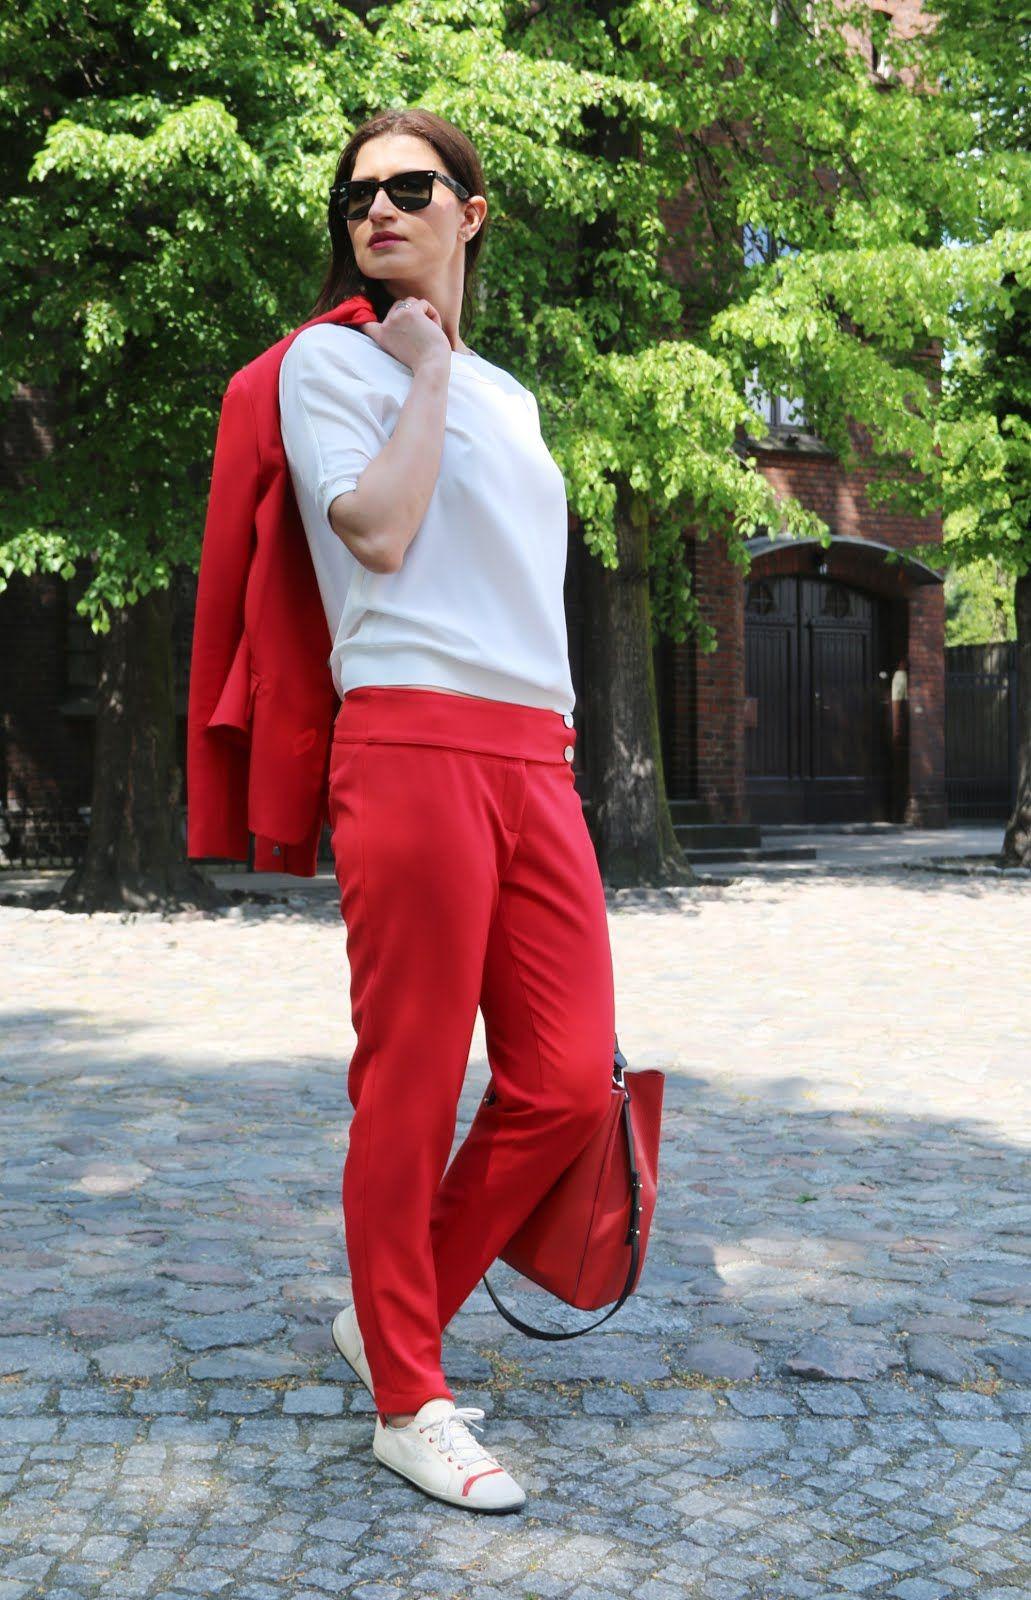 Office Style Czerwony Garnitur I Biale Trampki Spring Street Style Street Style Spring Fashion